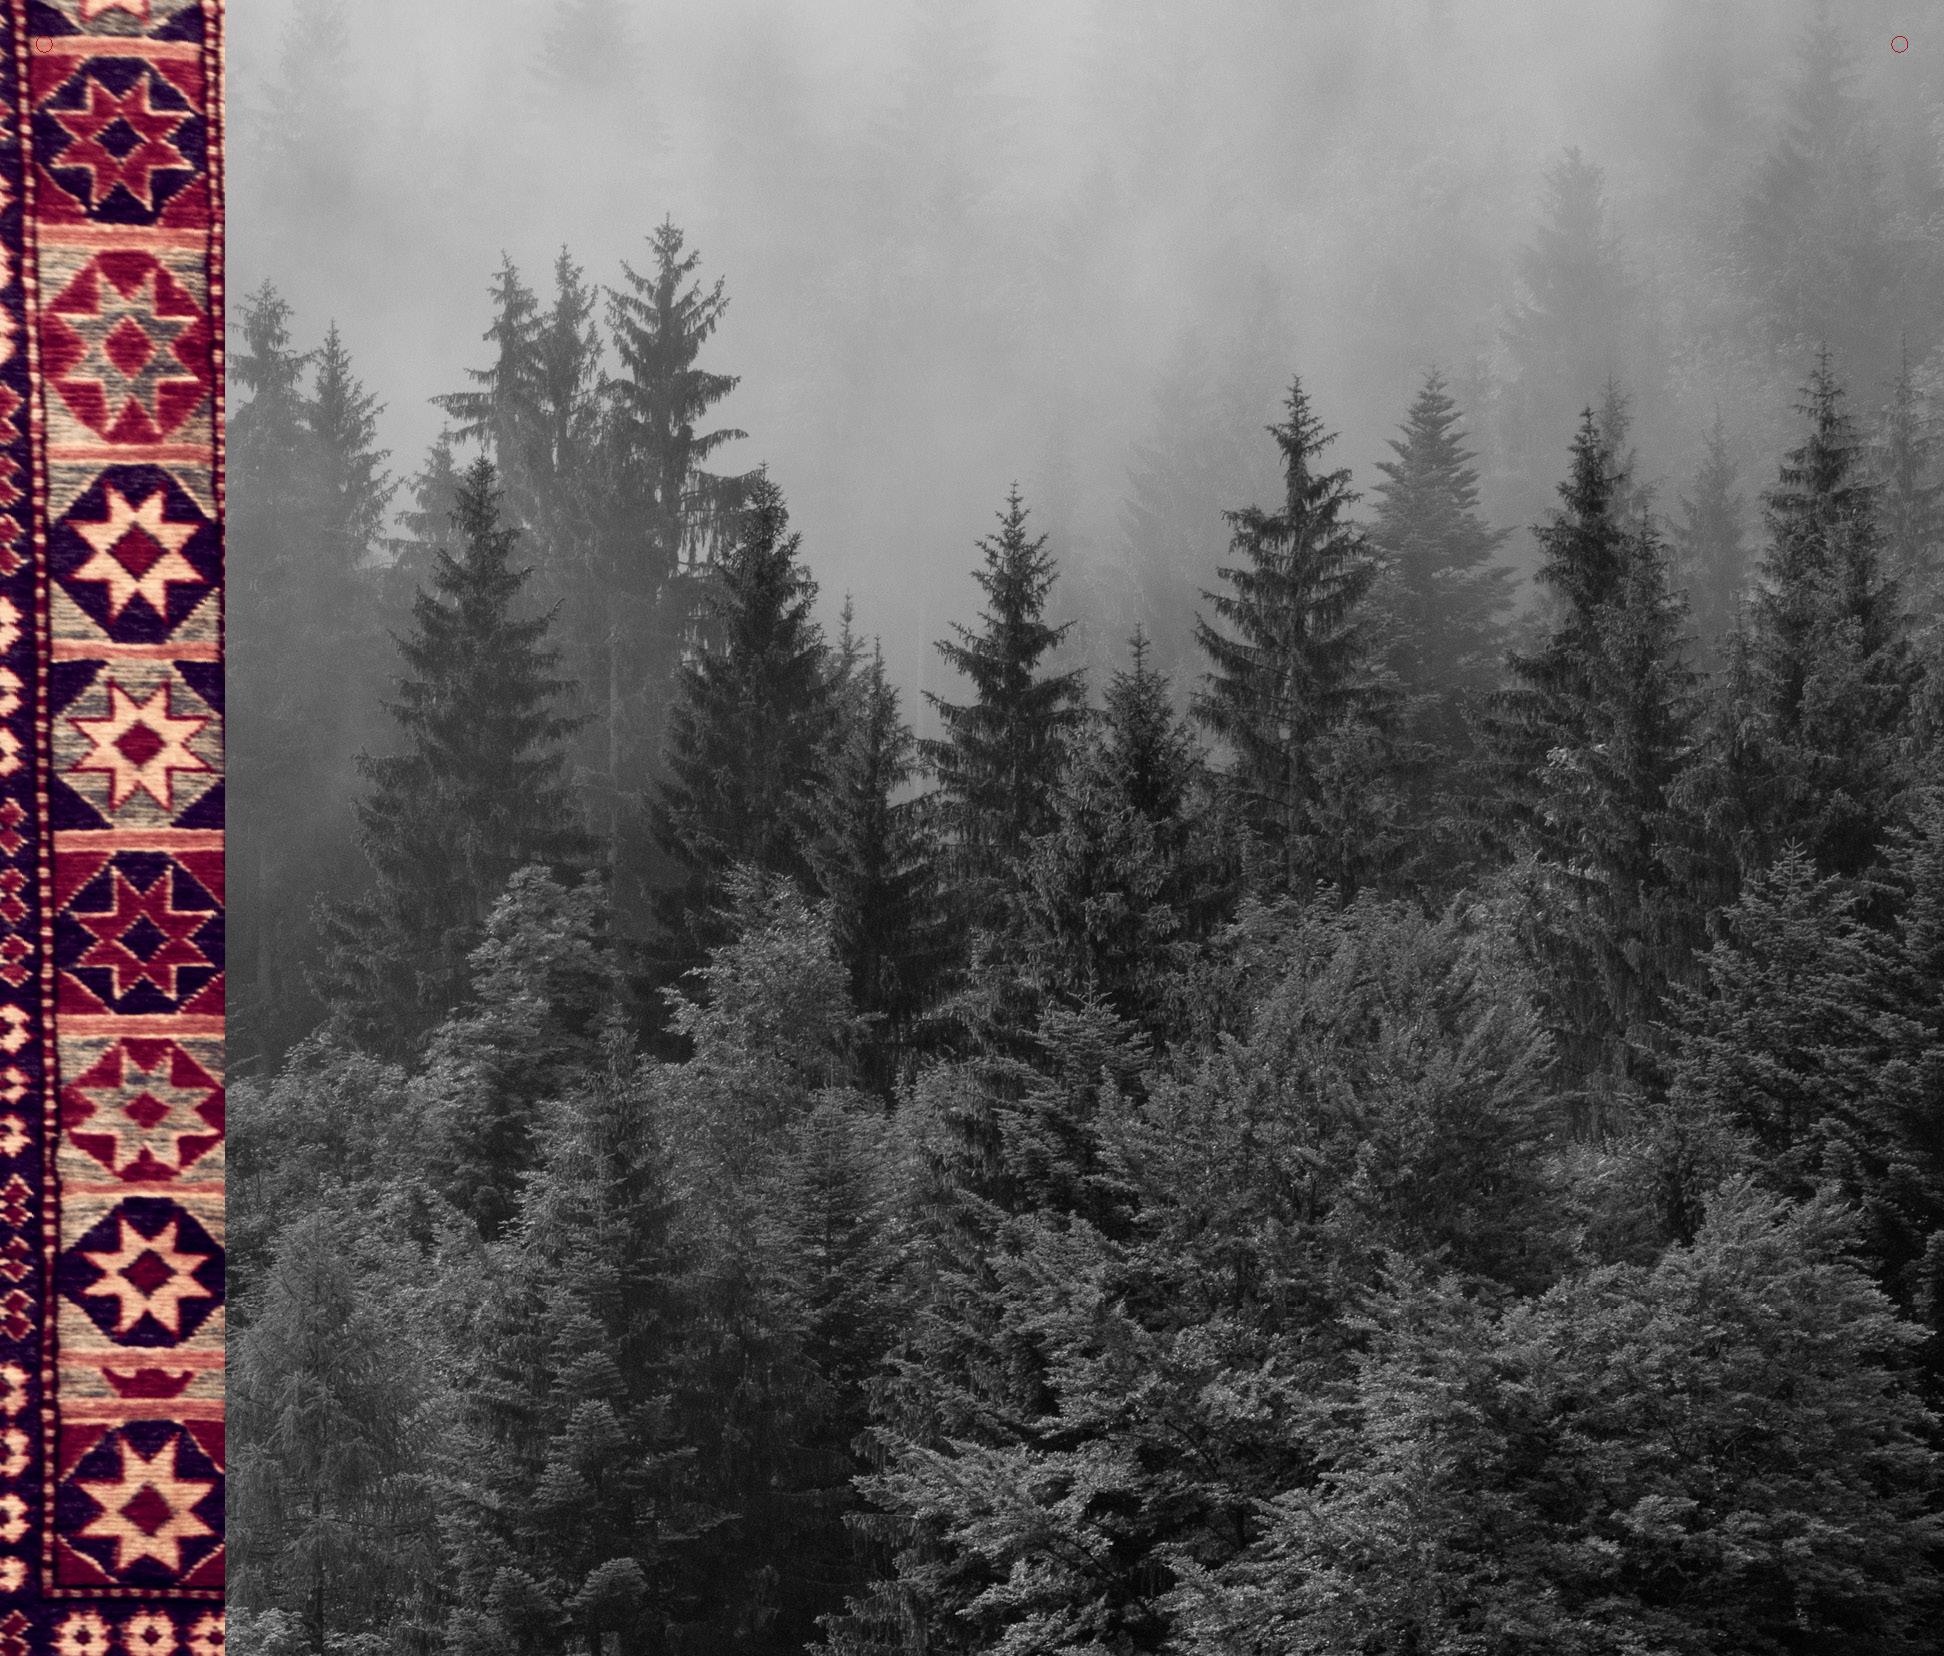 25x23_wallposter_poles_background_october_fall16.jpg